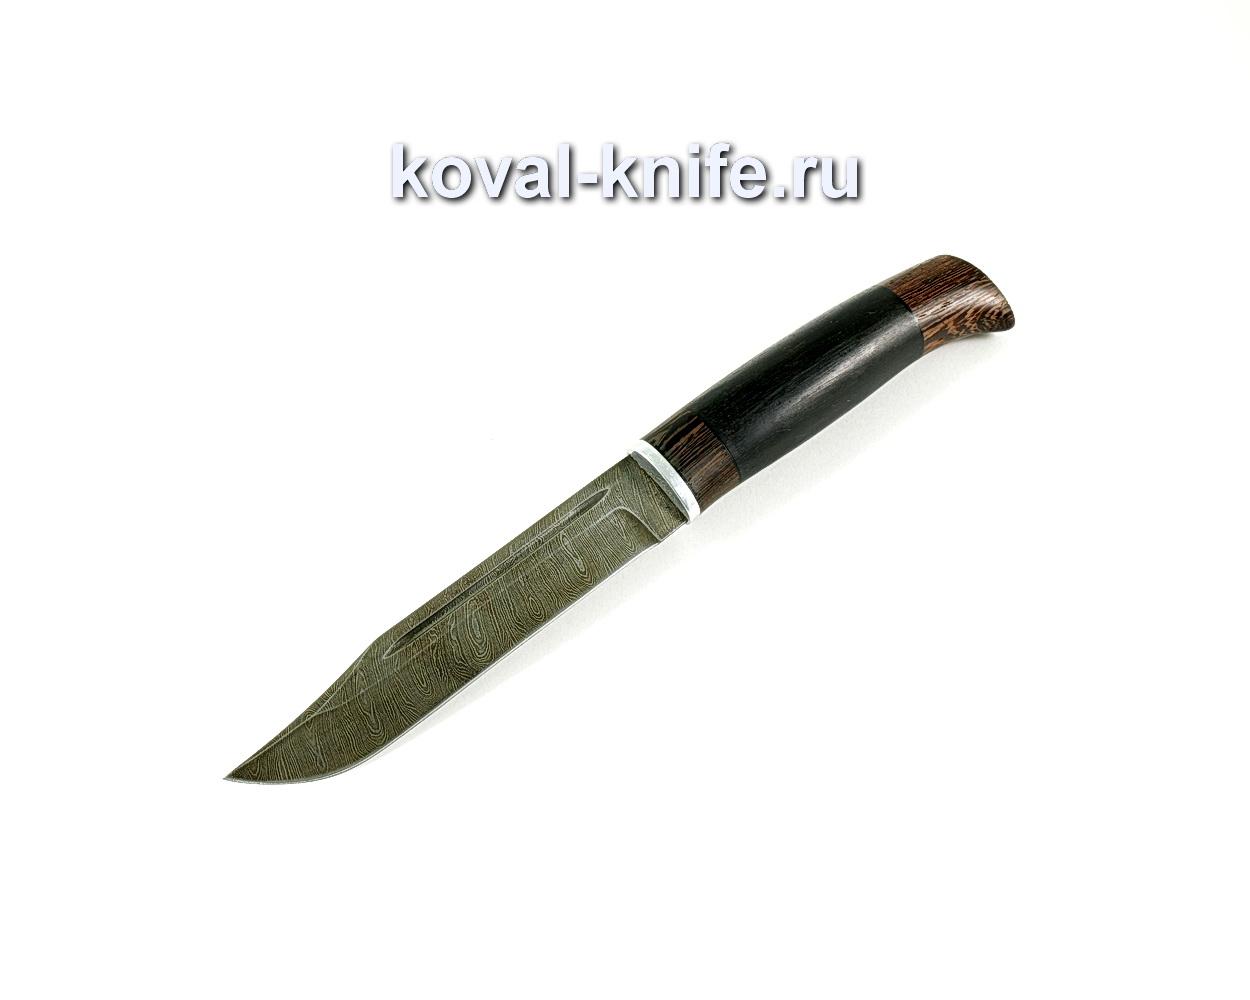 Нож Штрафбат (сталь Дамасская), рукоять венге, граб A230